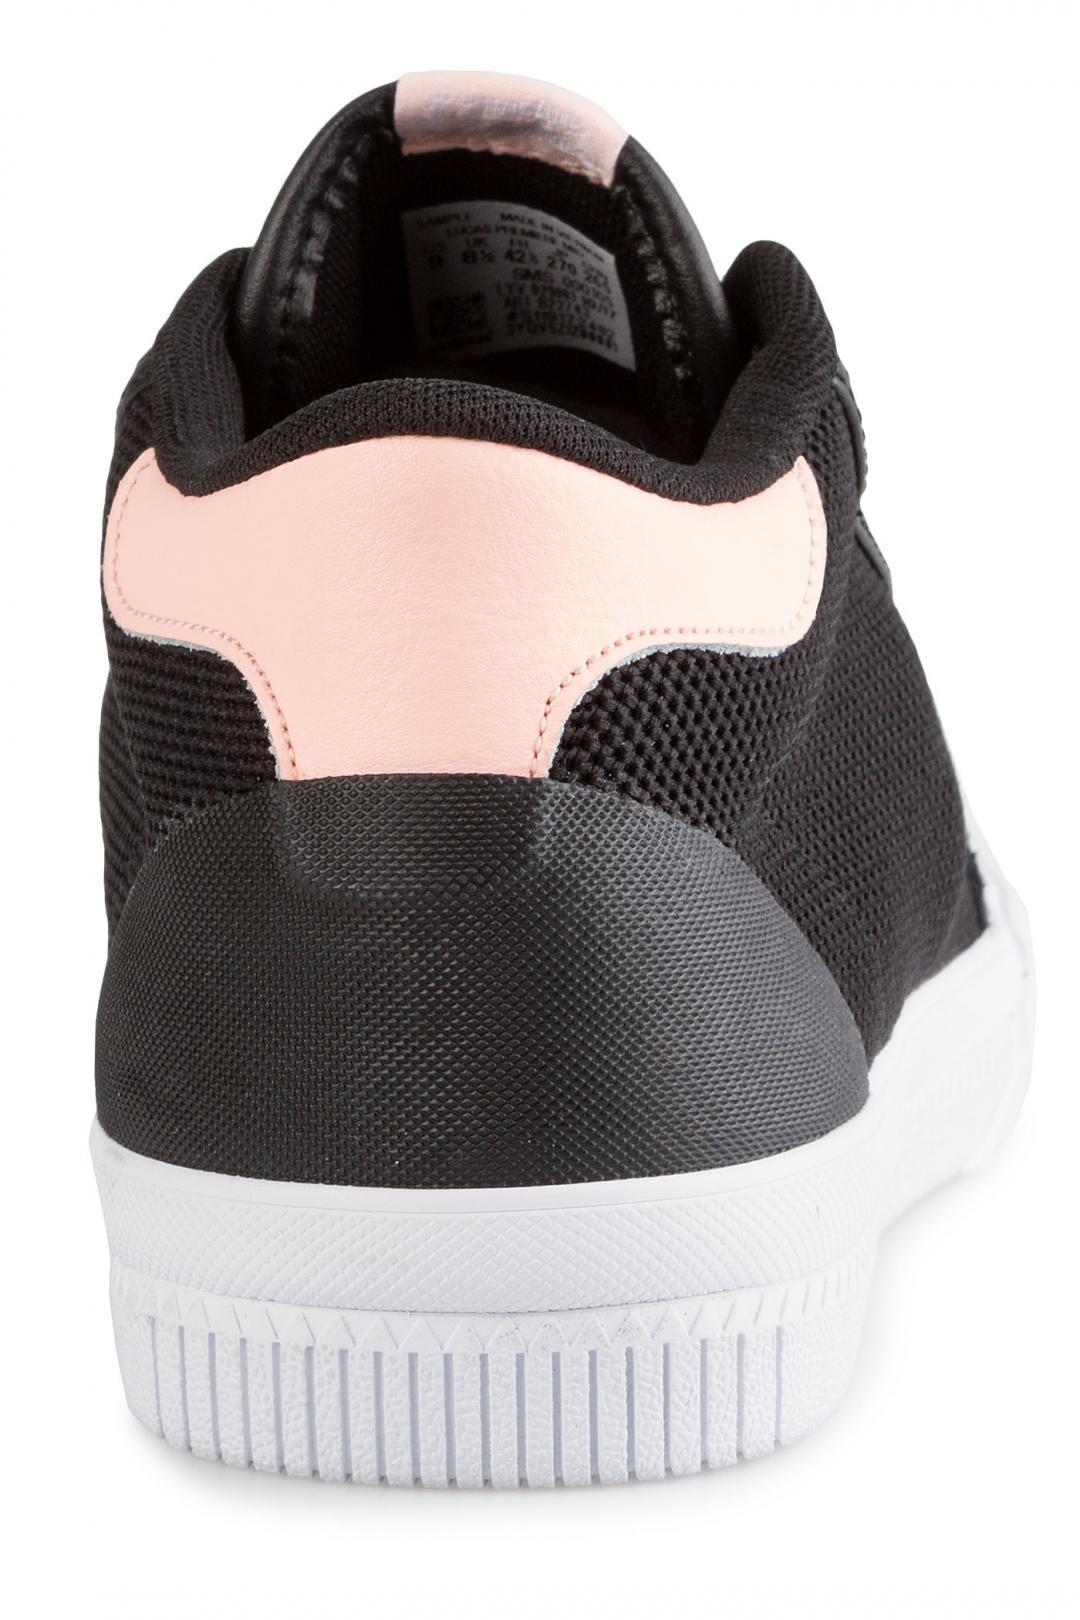 Uomo adidas Skateboarding Lucas Premiere Mid core black white   Sneaker